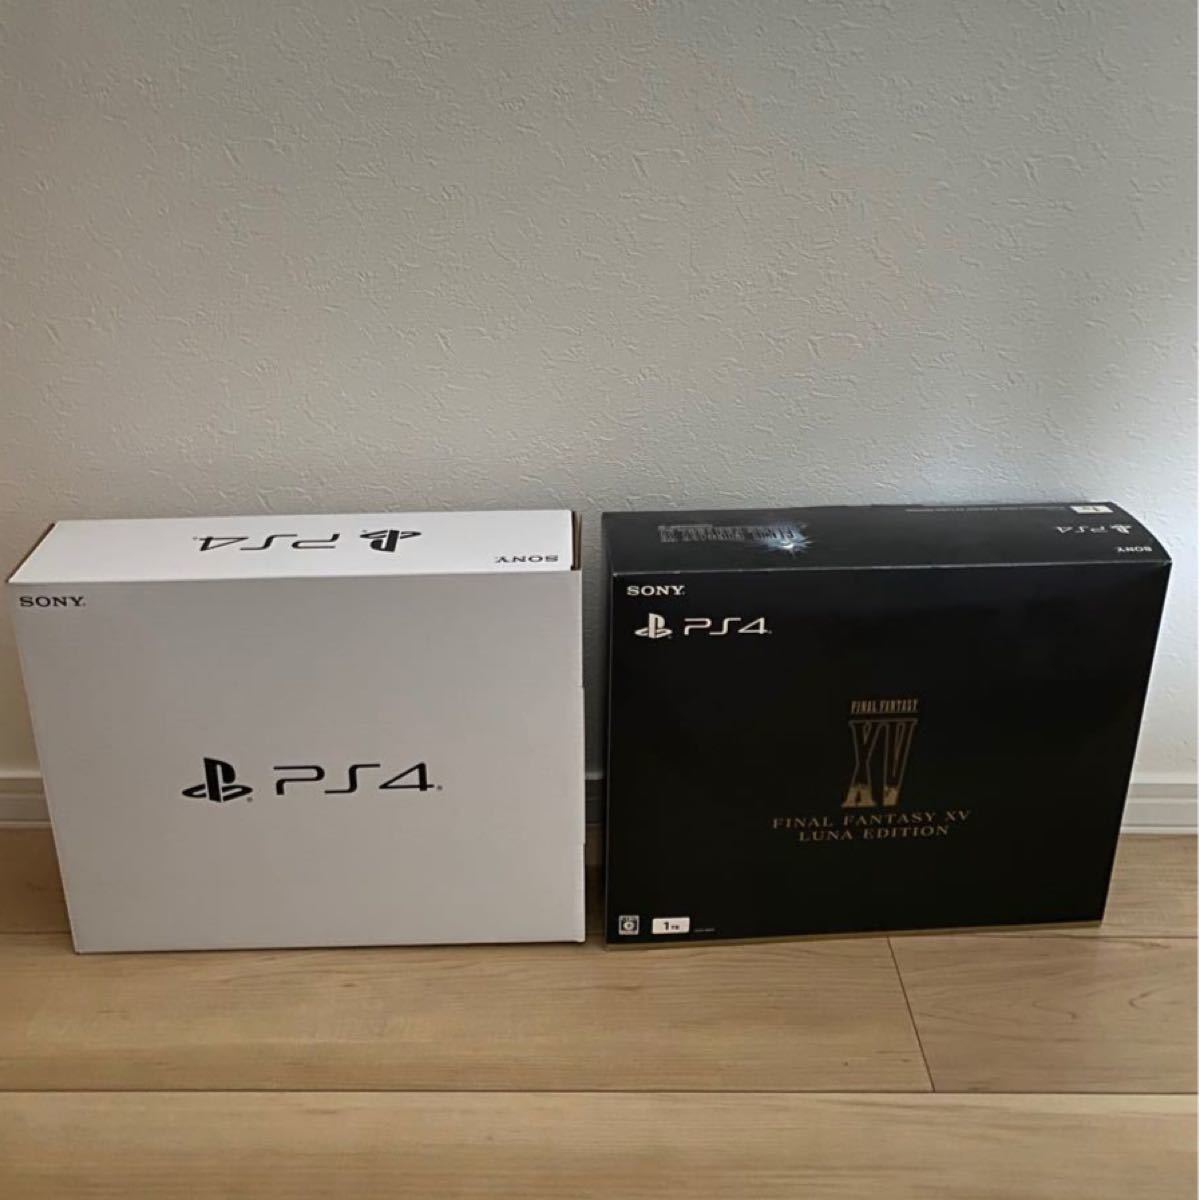 PS4 FINAL FANTASY XV LUNA EDITION (1TB)